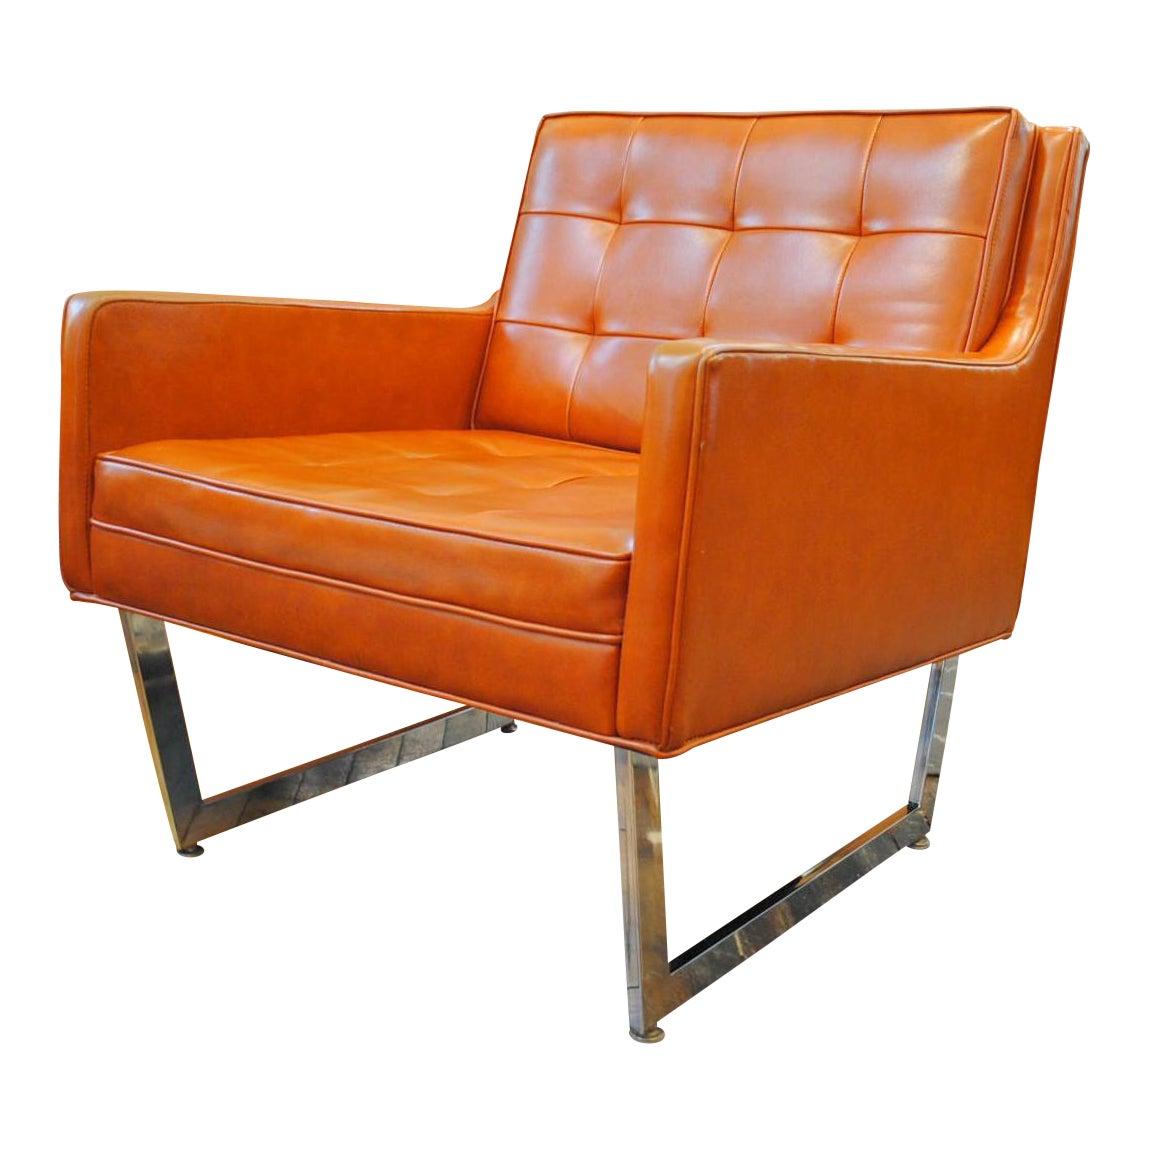 Patrician mid century modern orange club chair chairish